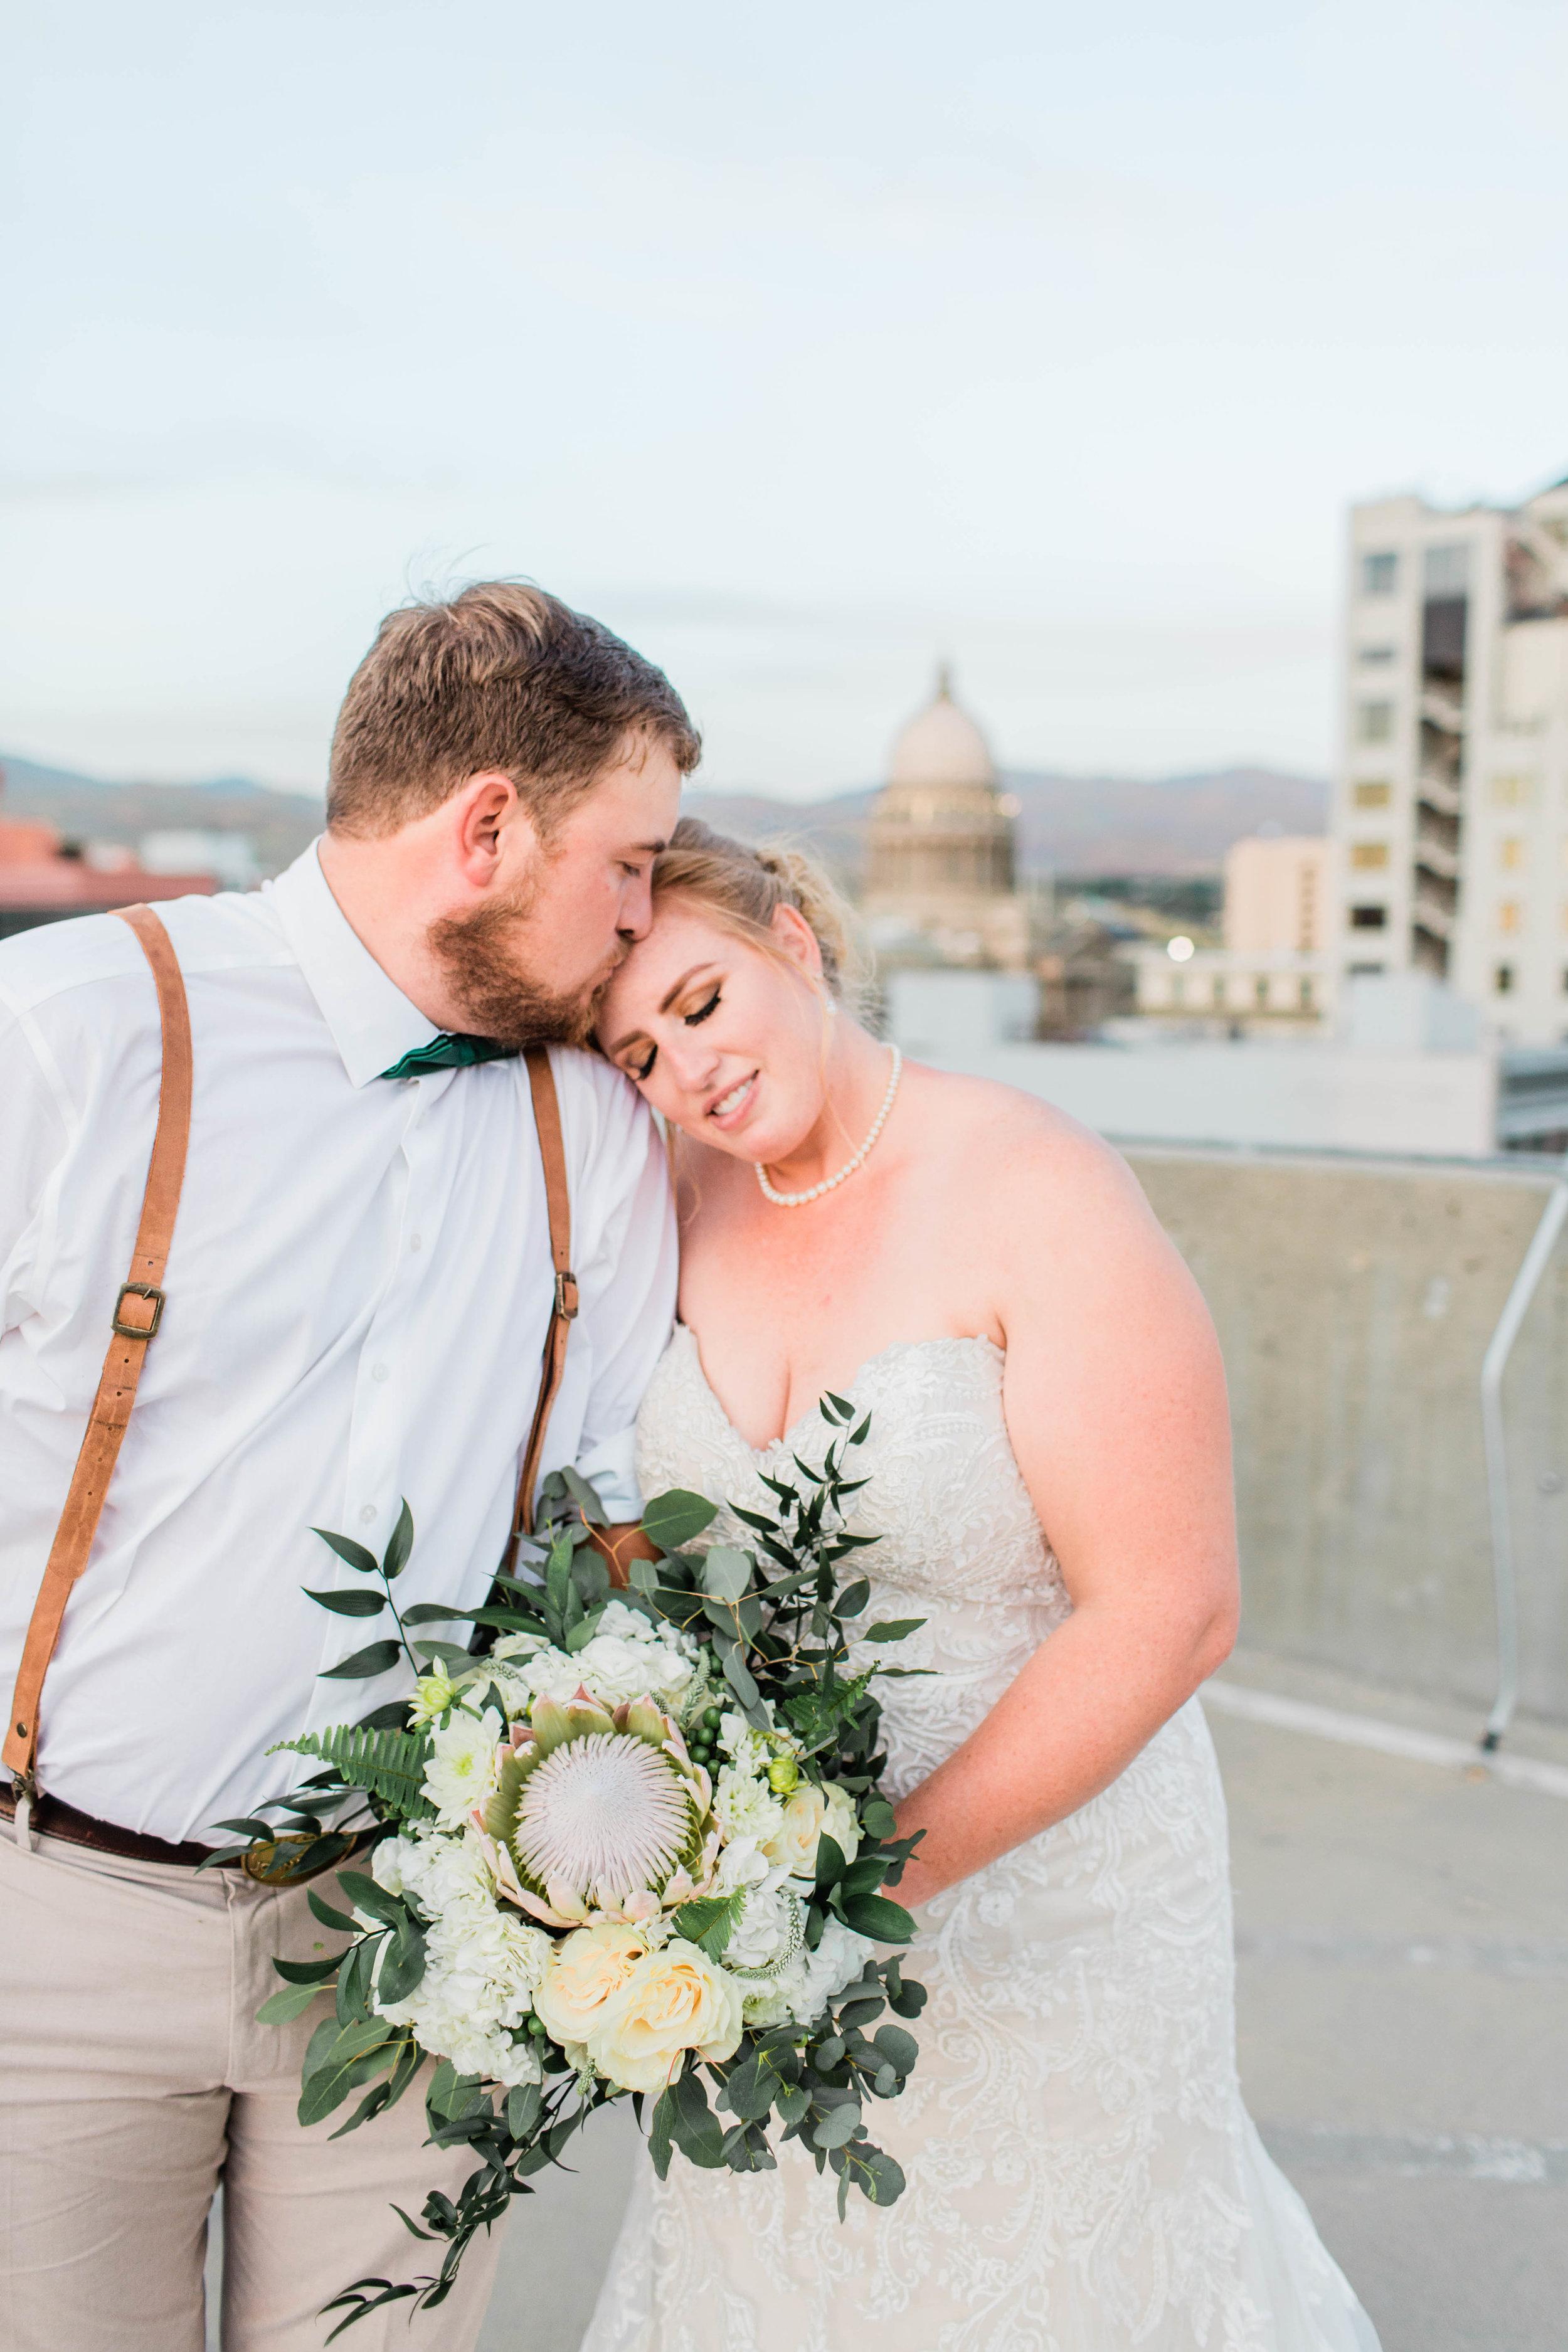 E-Lydia-Rohan-Downtown-Boise-Wedding-25.jpg